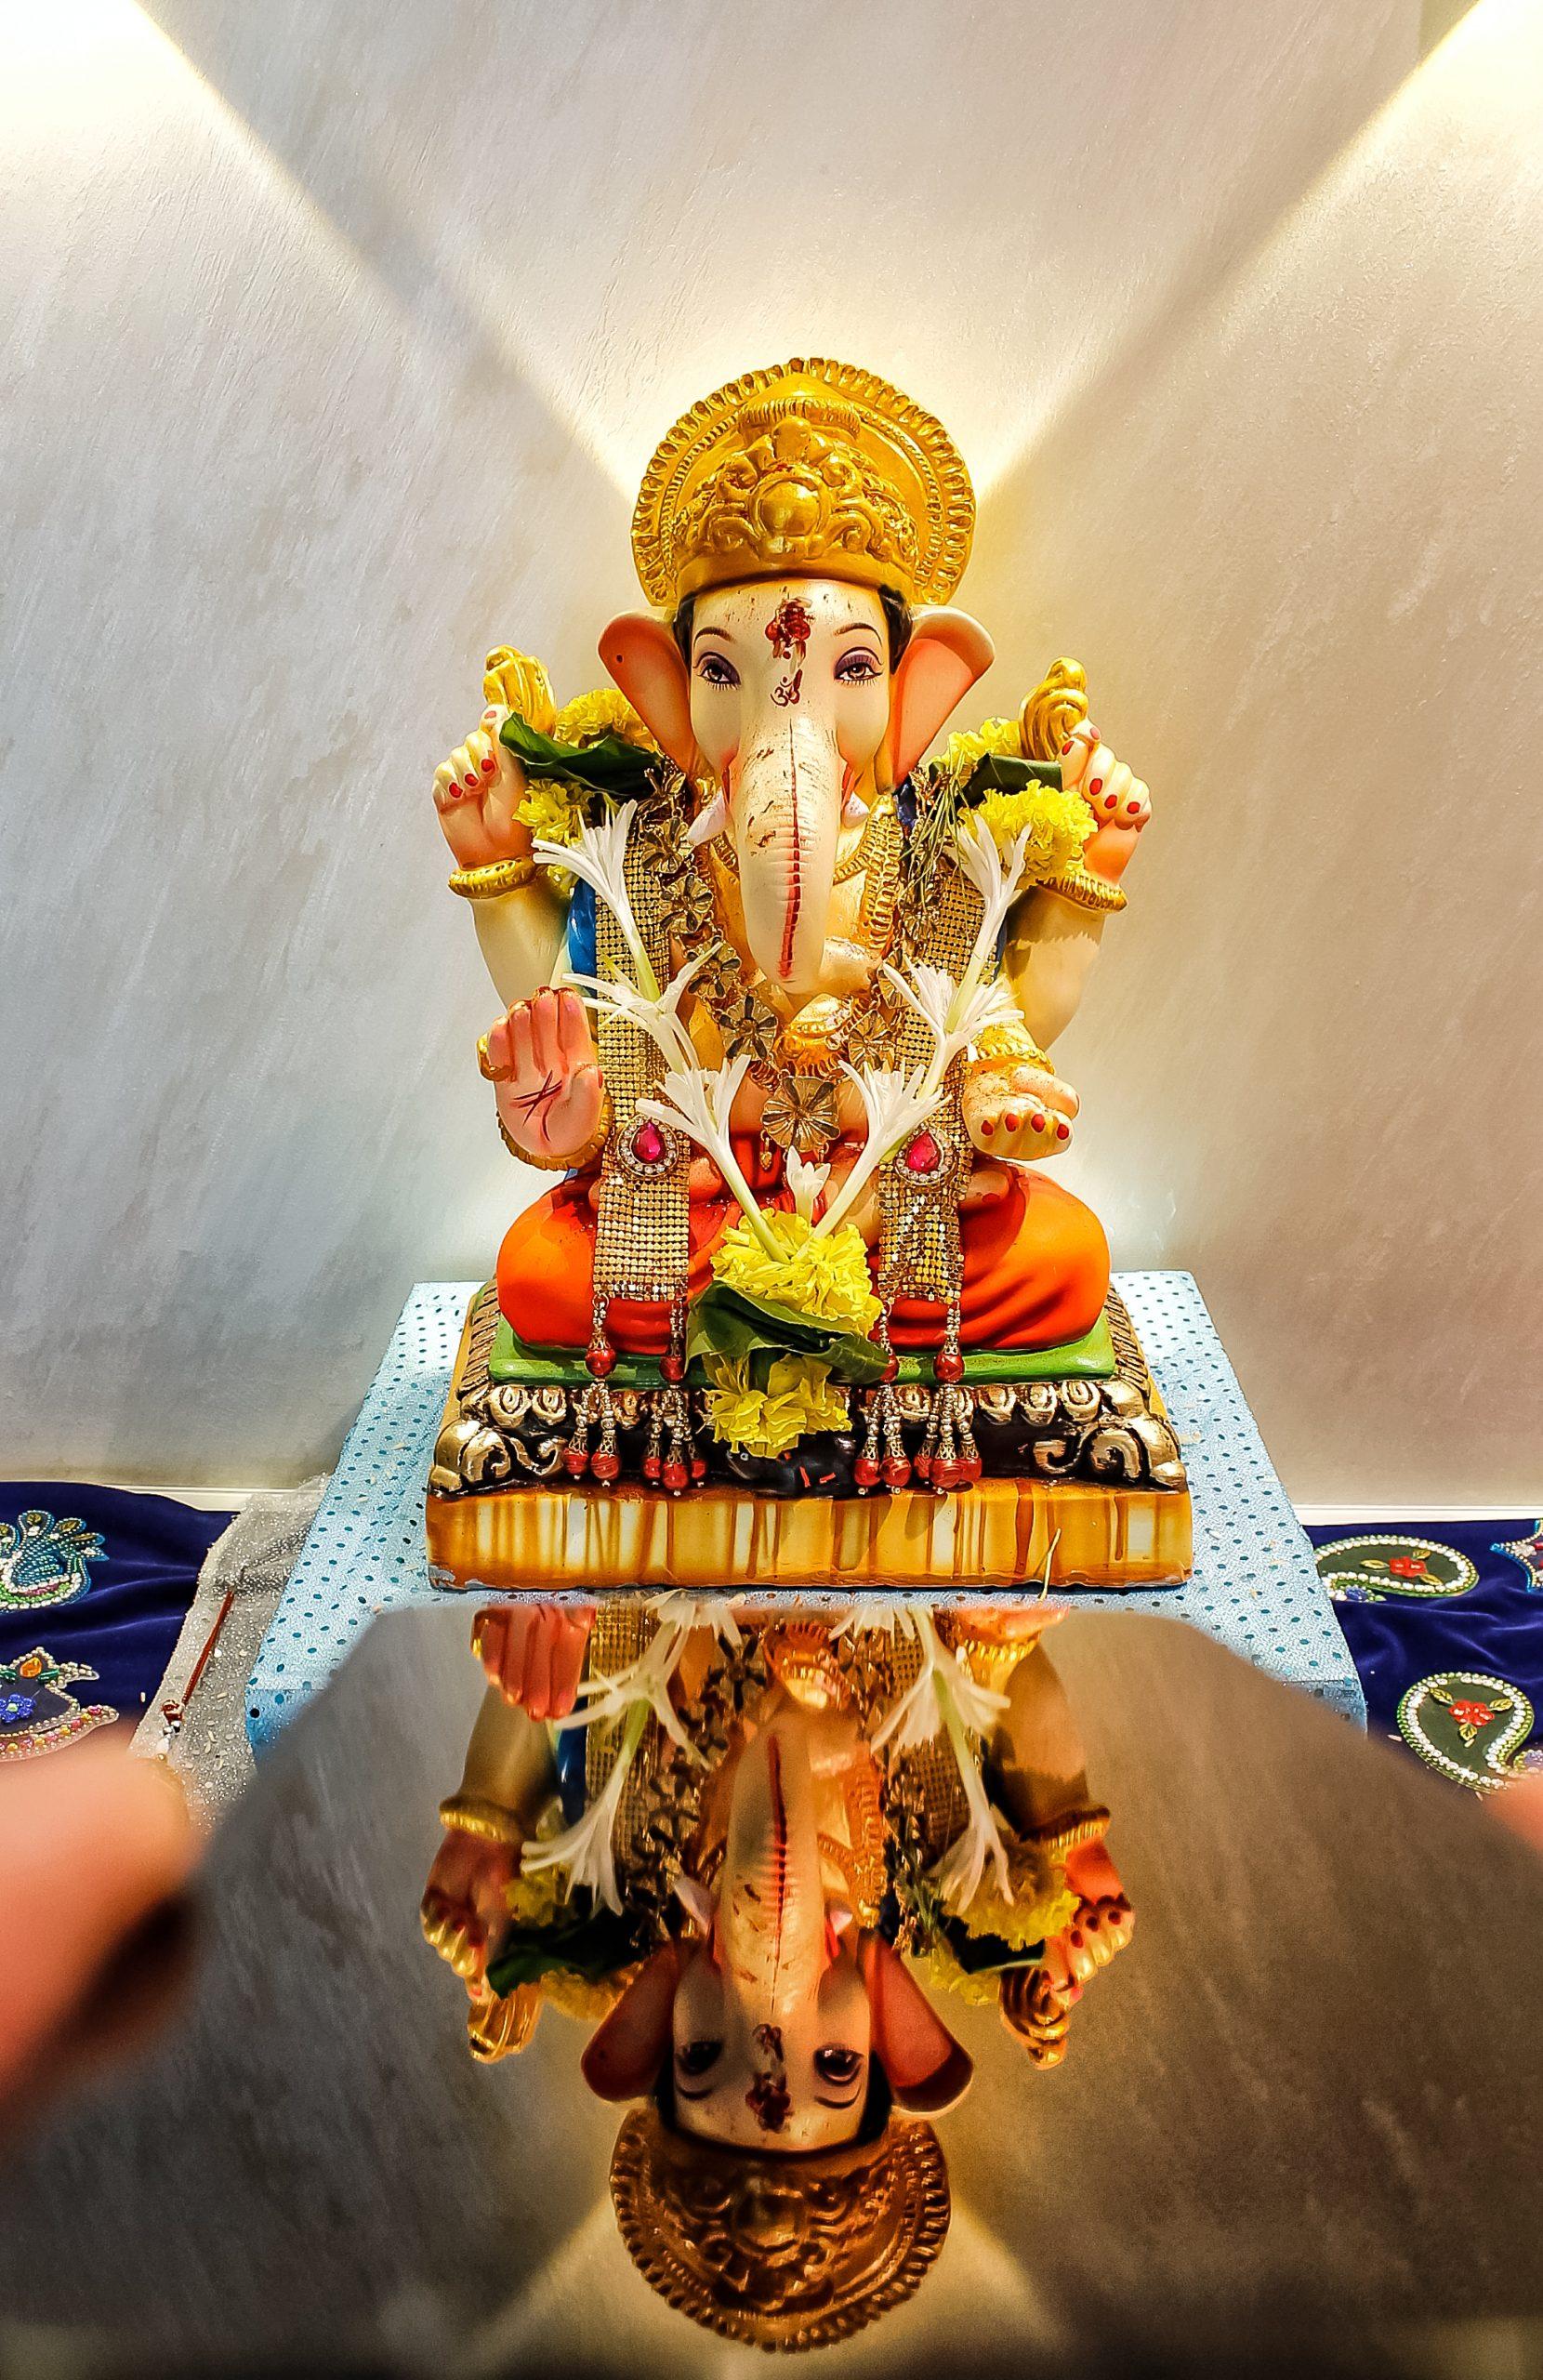 Lord Ganesha reflection on mobile screen